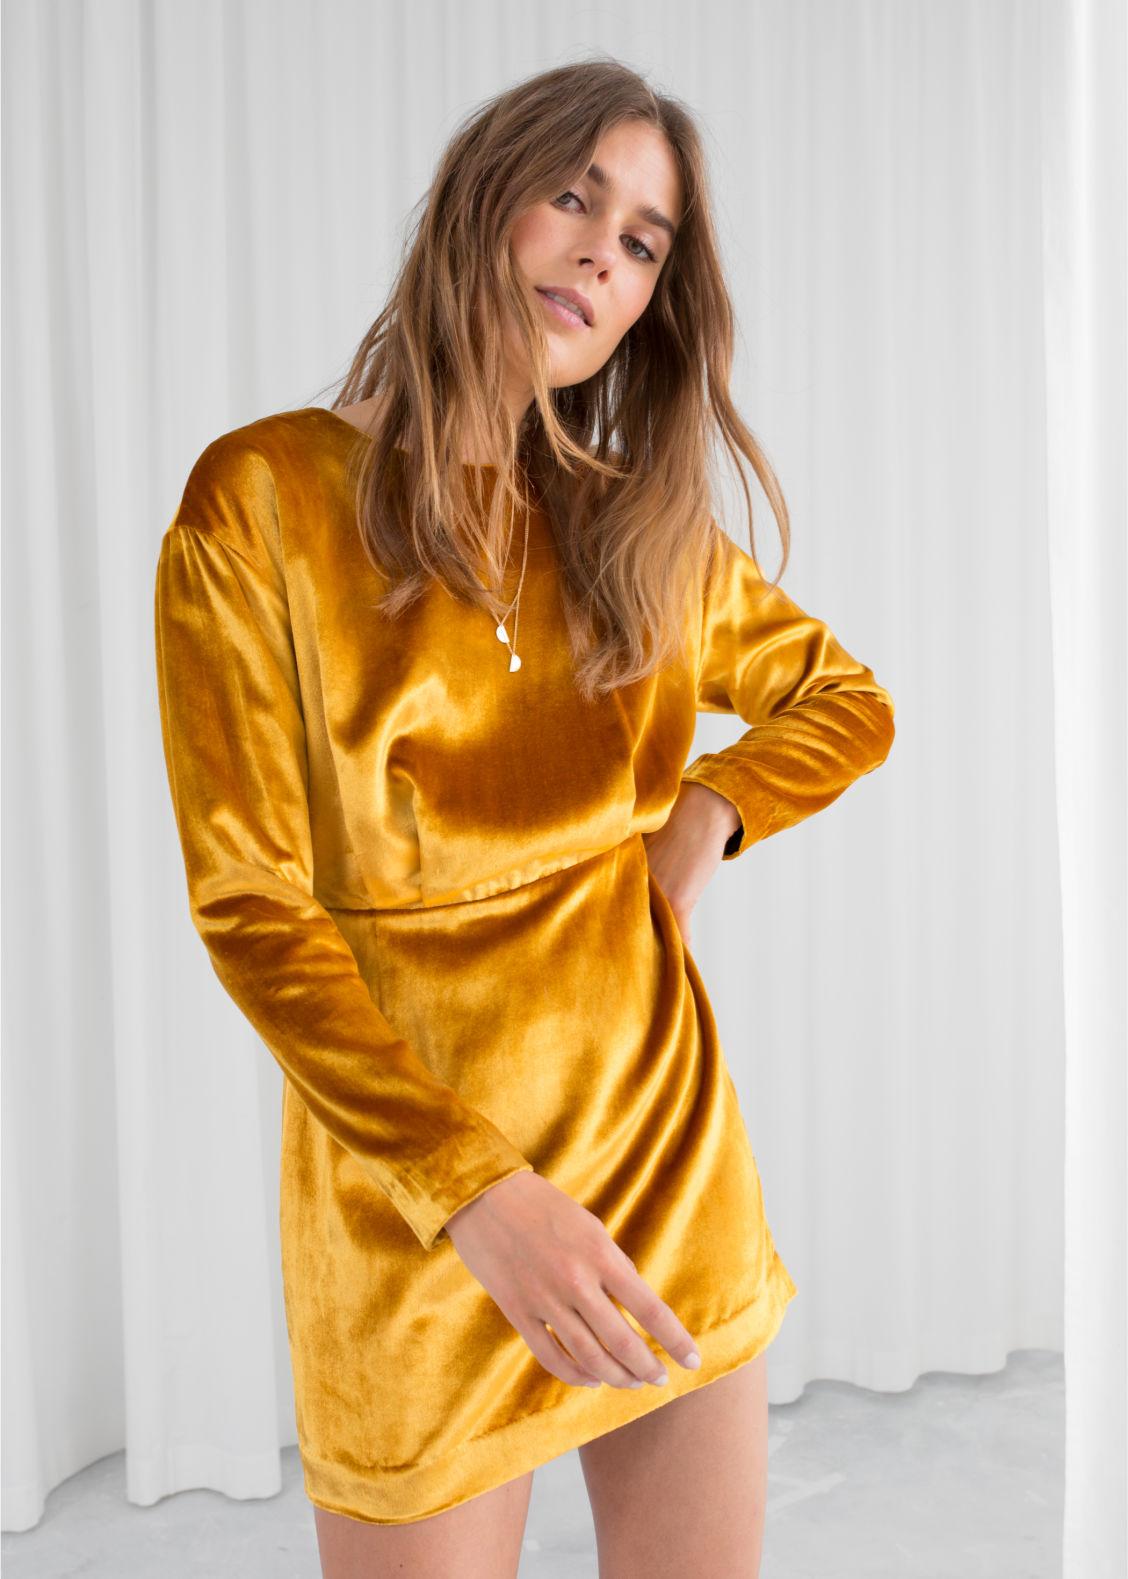 1da509937e08 Other Back Mini Dress Stories Slit Dresses Yellow amp  WaYnBHn